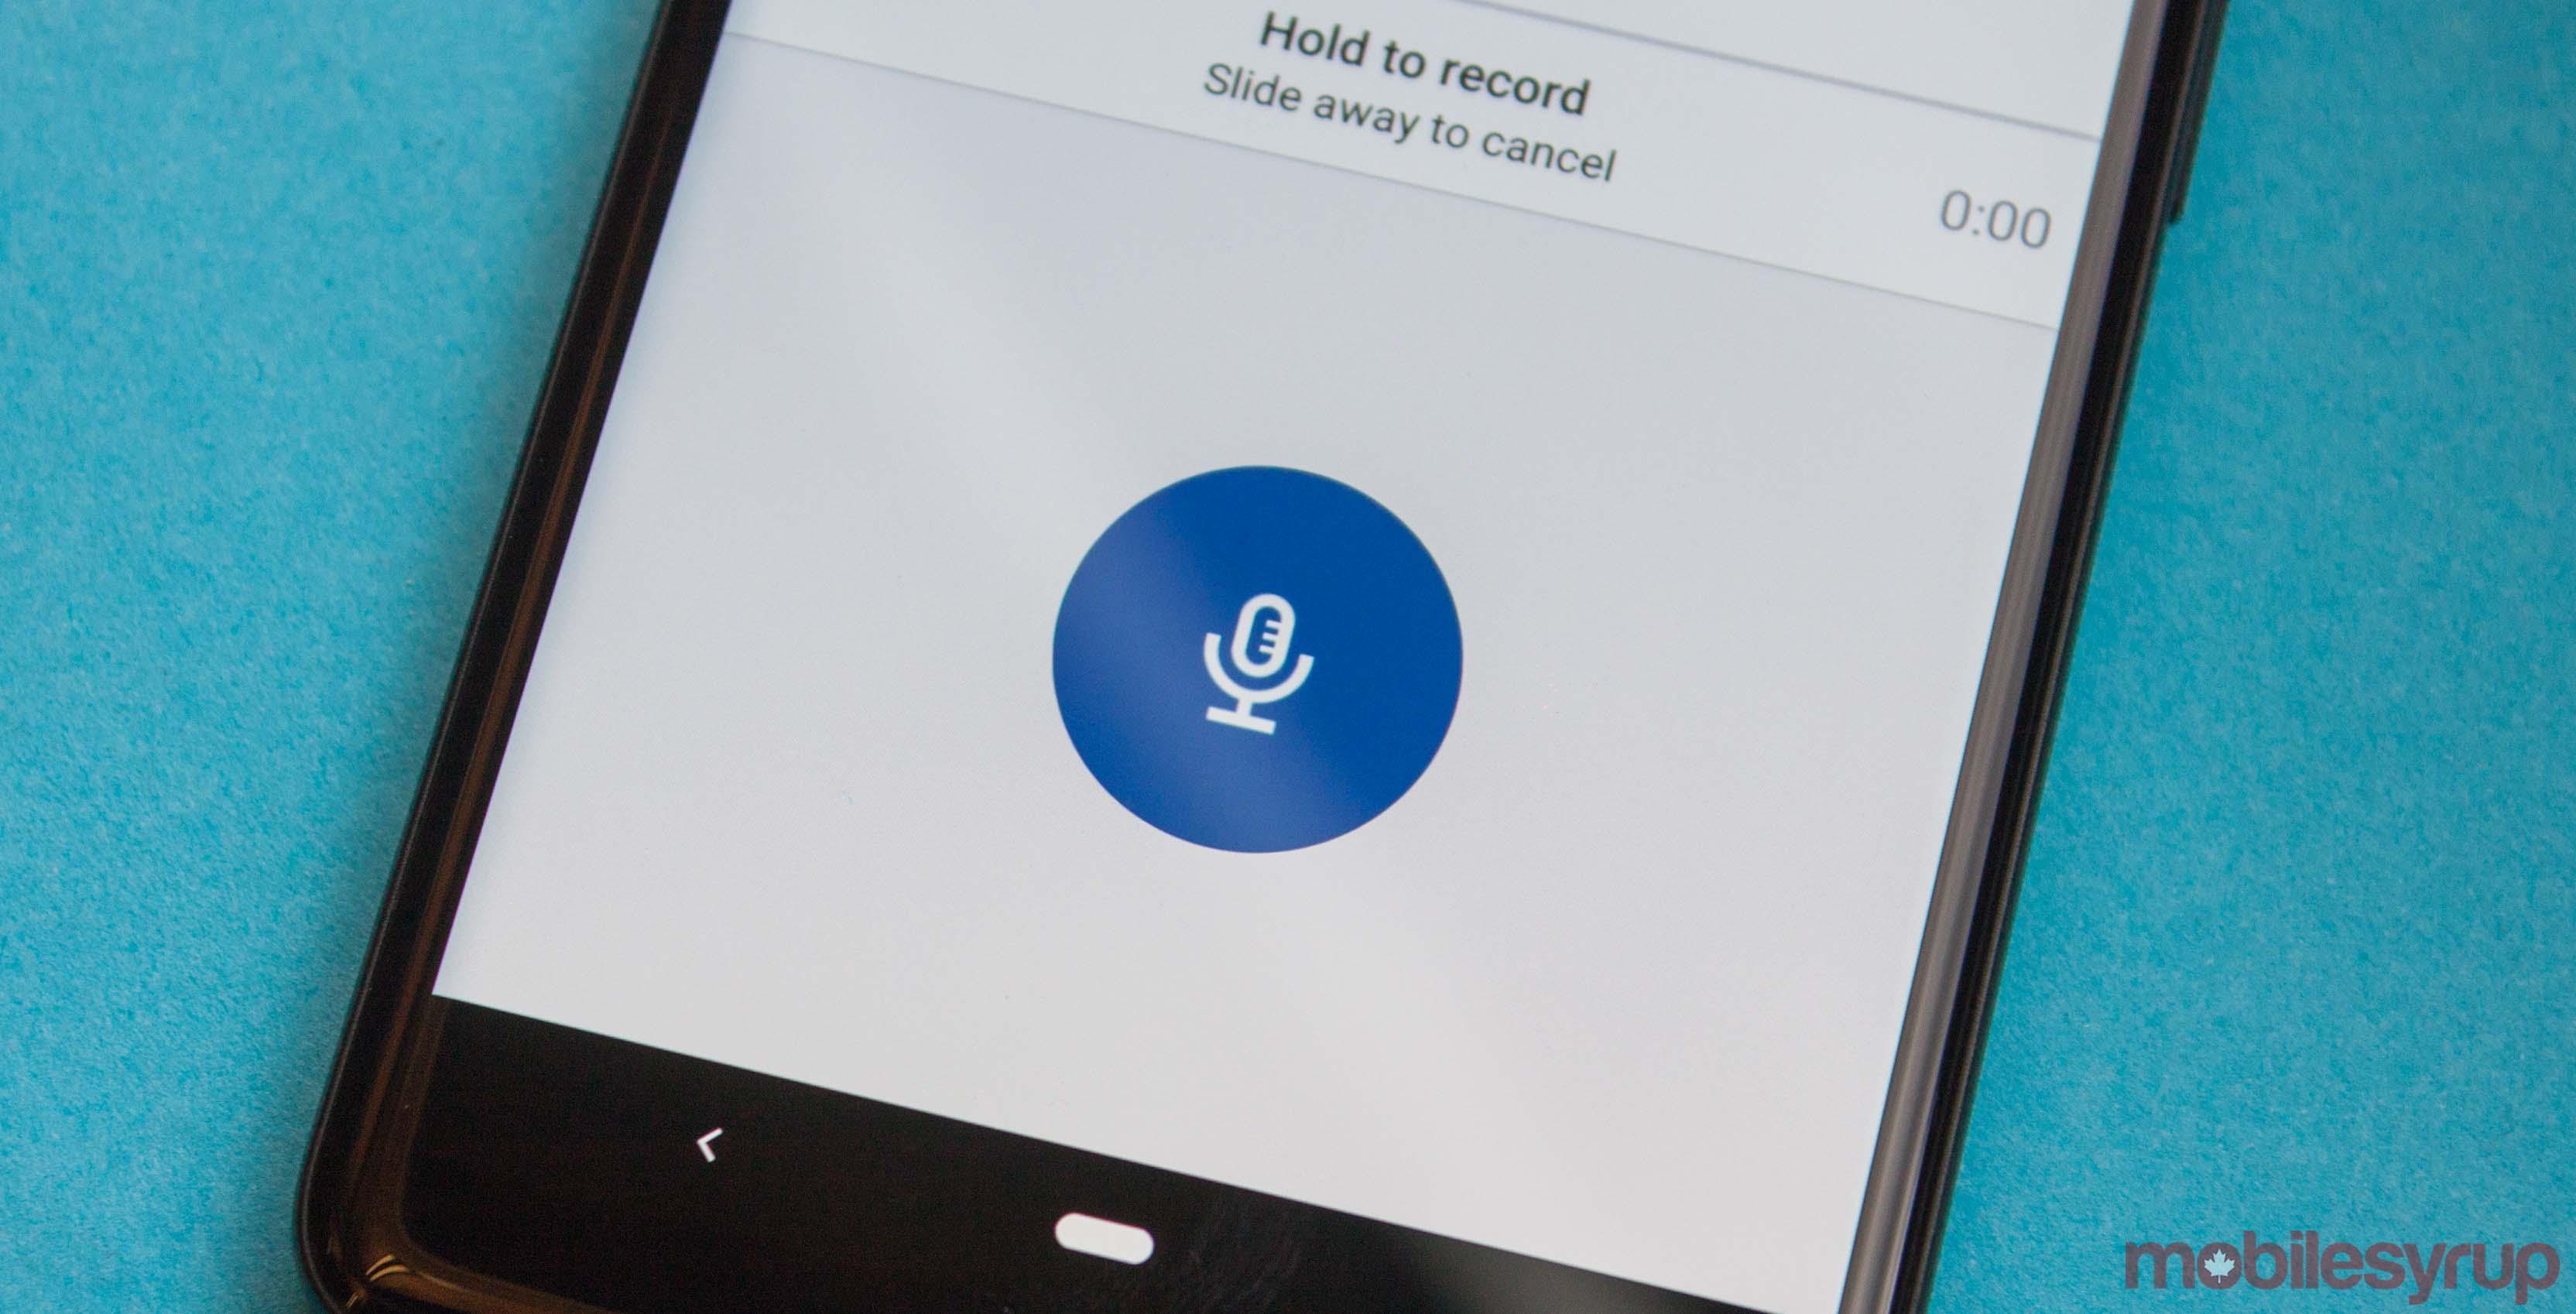 LinkedIn voice messaging